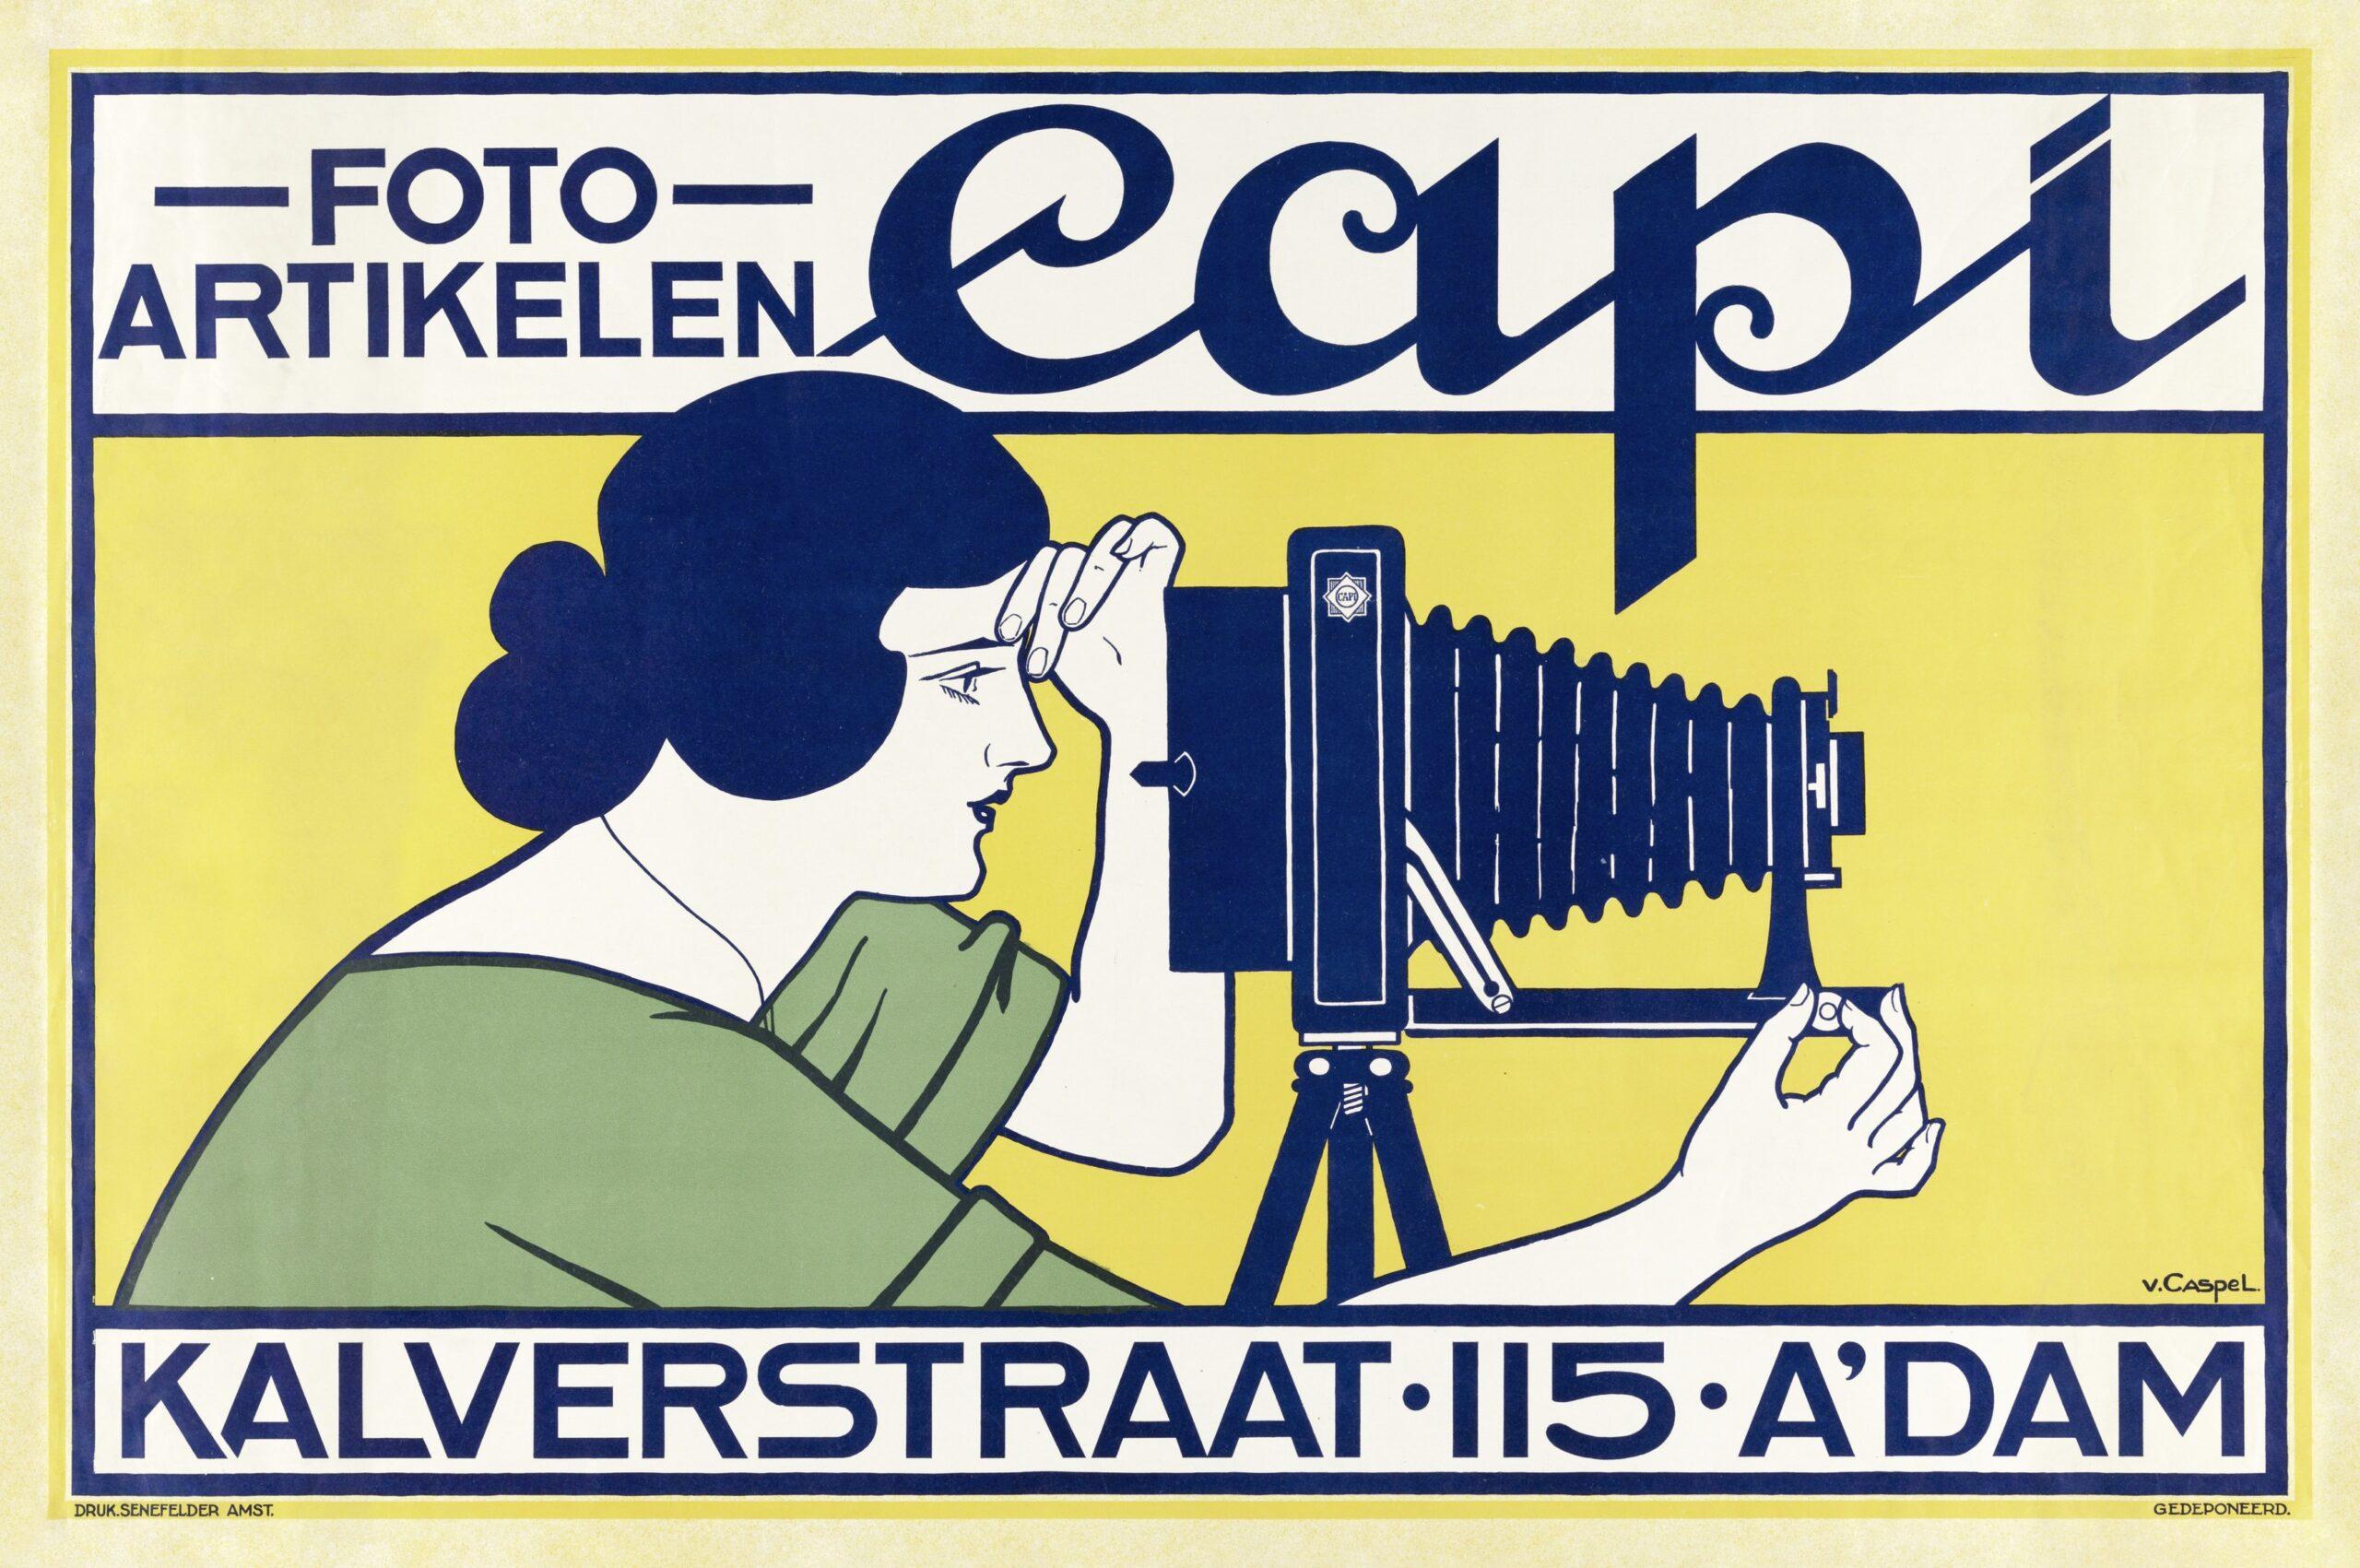 Fotoartikelen Capi; Kalverstraat 115 Amsterdam (18) by Johann Georg van Caspel. Original from The Rijksmuseum. Digitally enhanced by rawpixel.